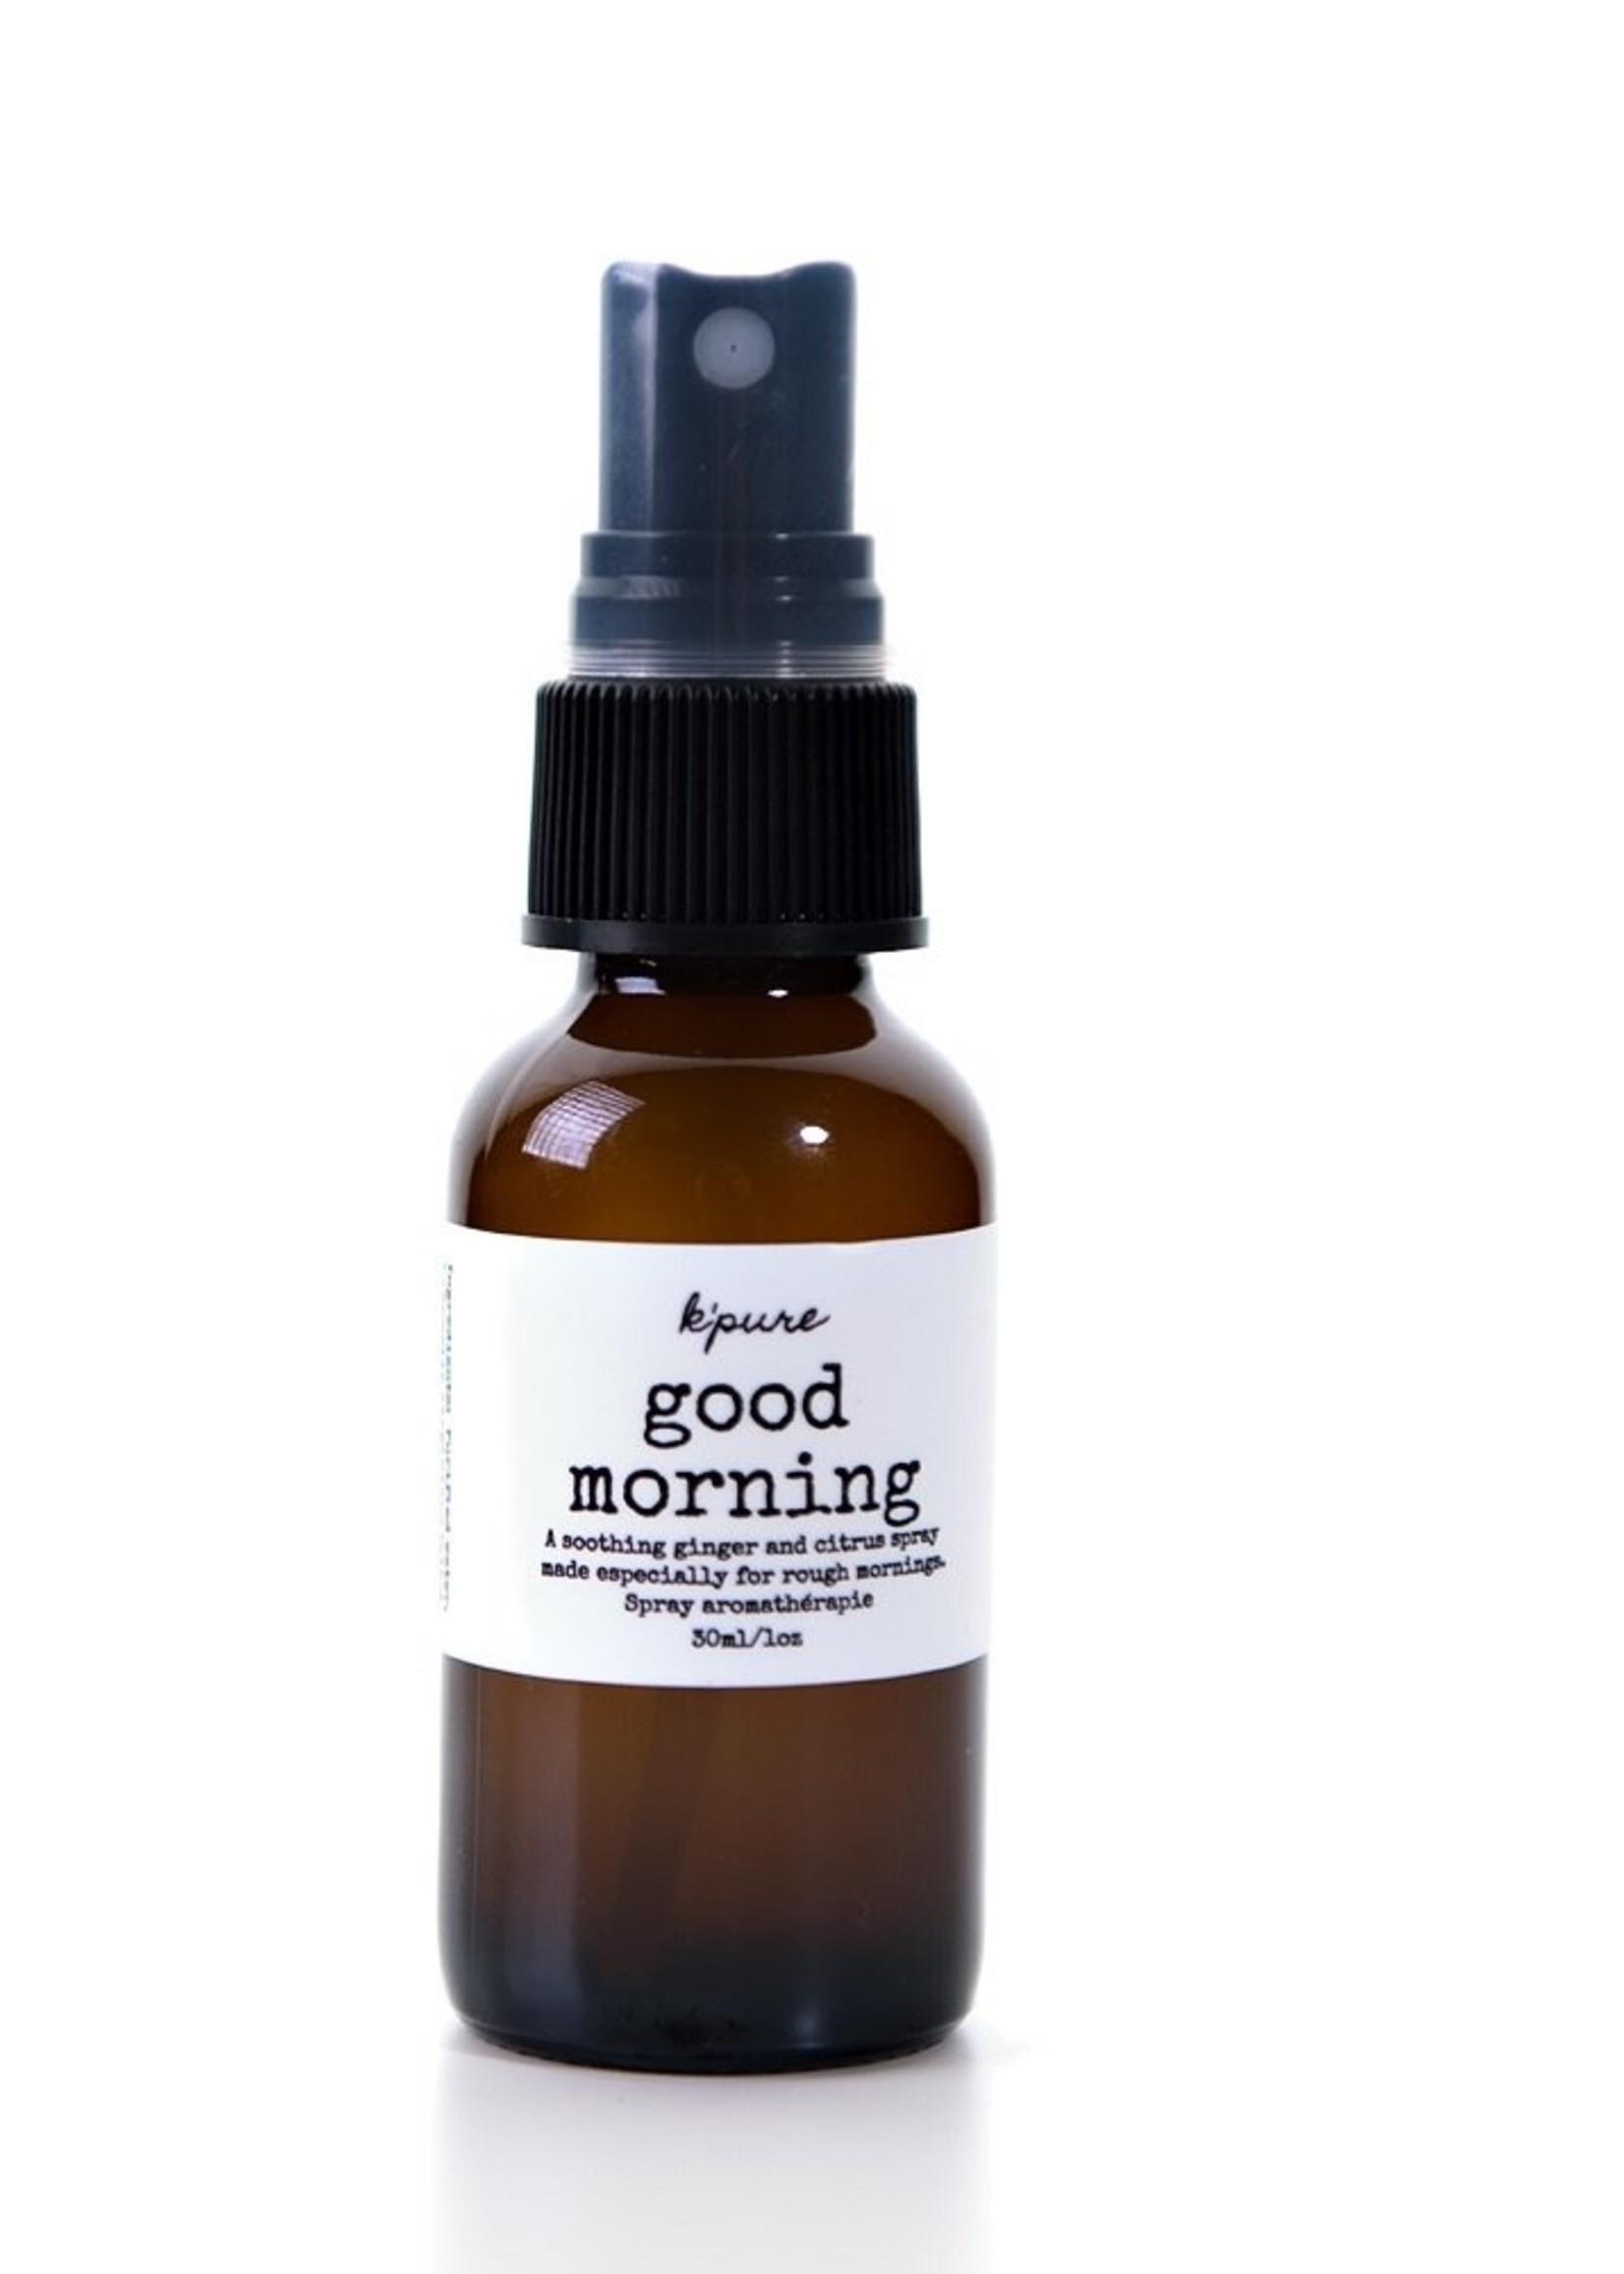 K'PURE GOOD MORNING essential oil mist